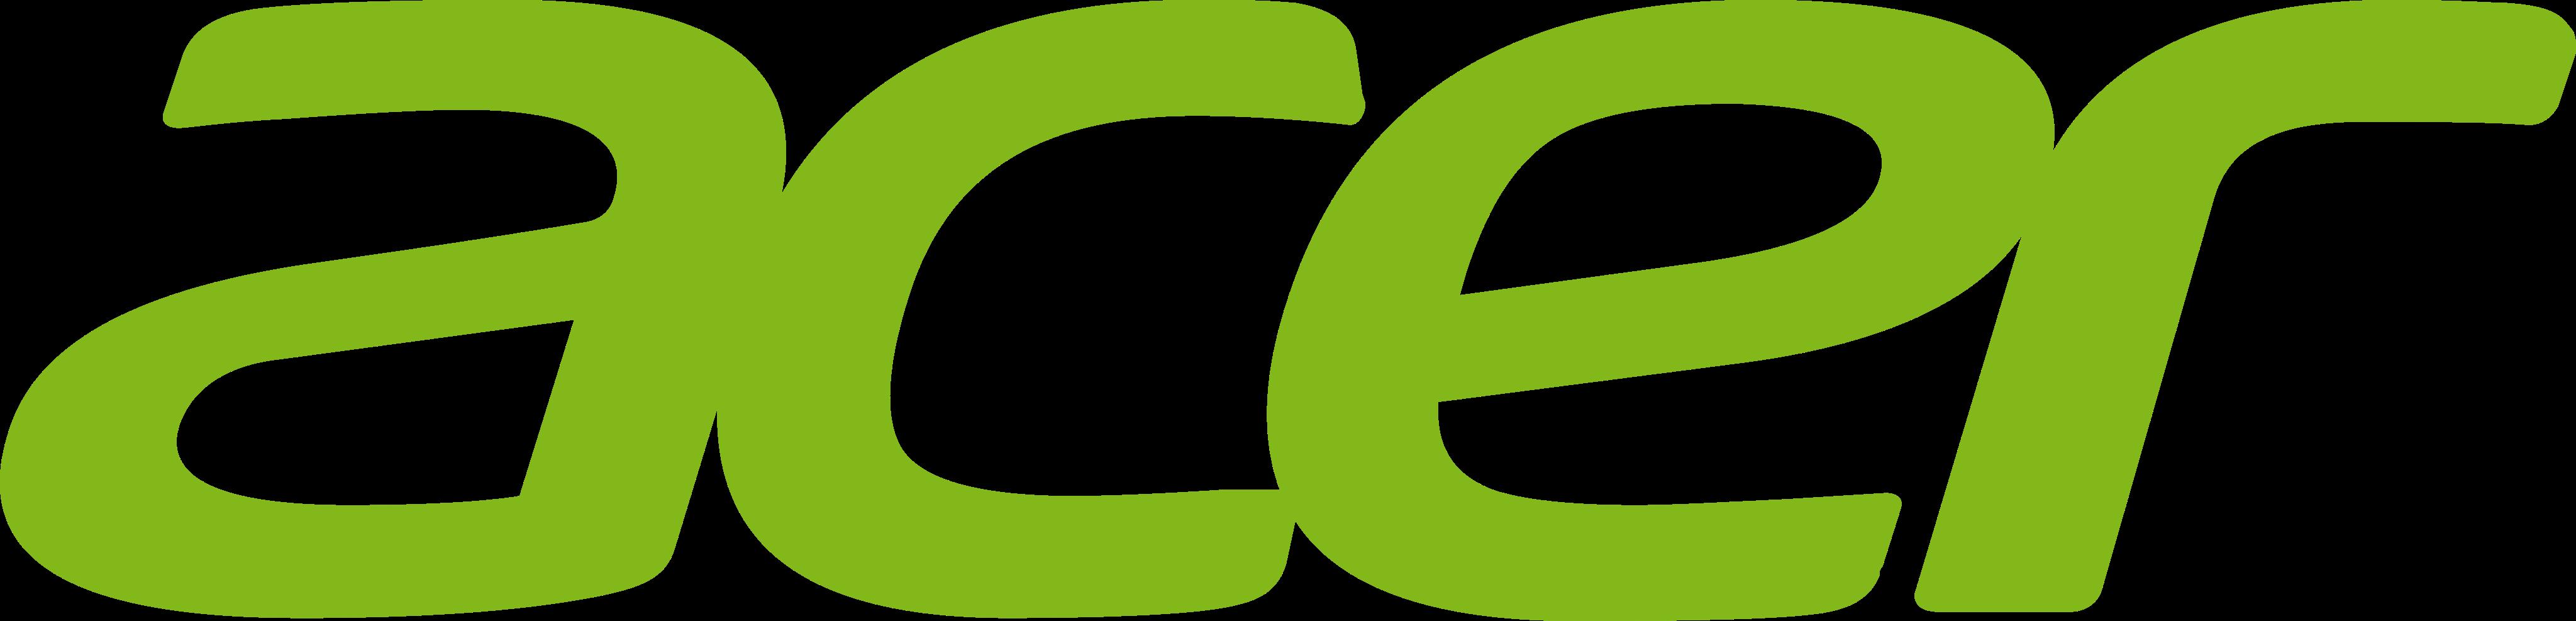 acer-logo-1